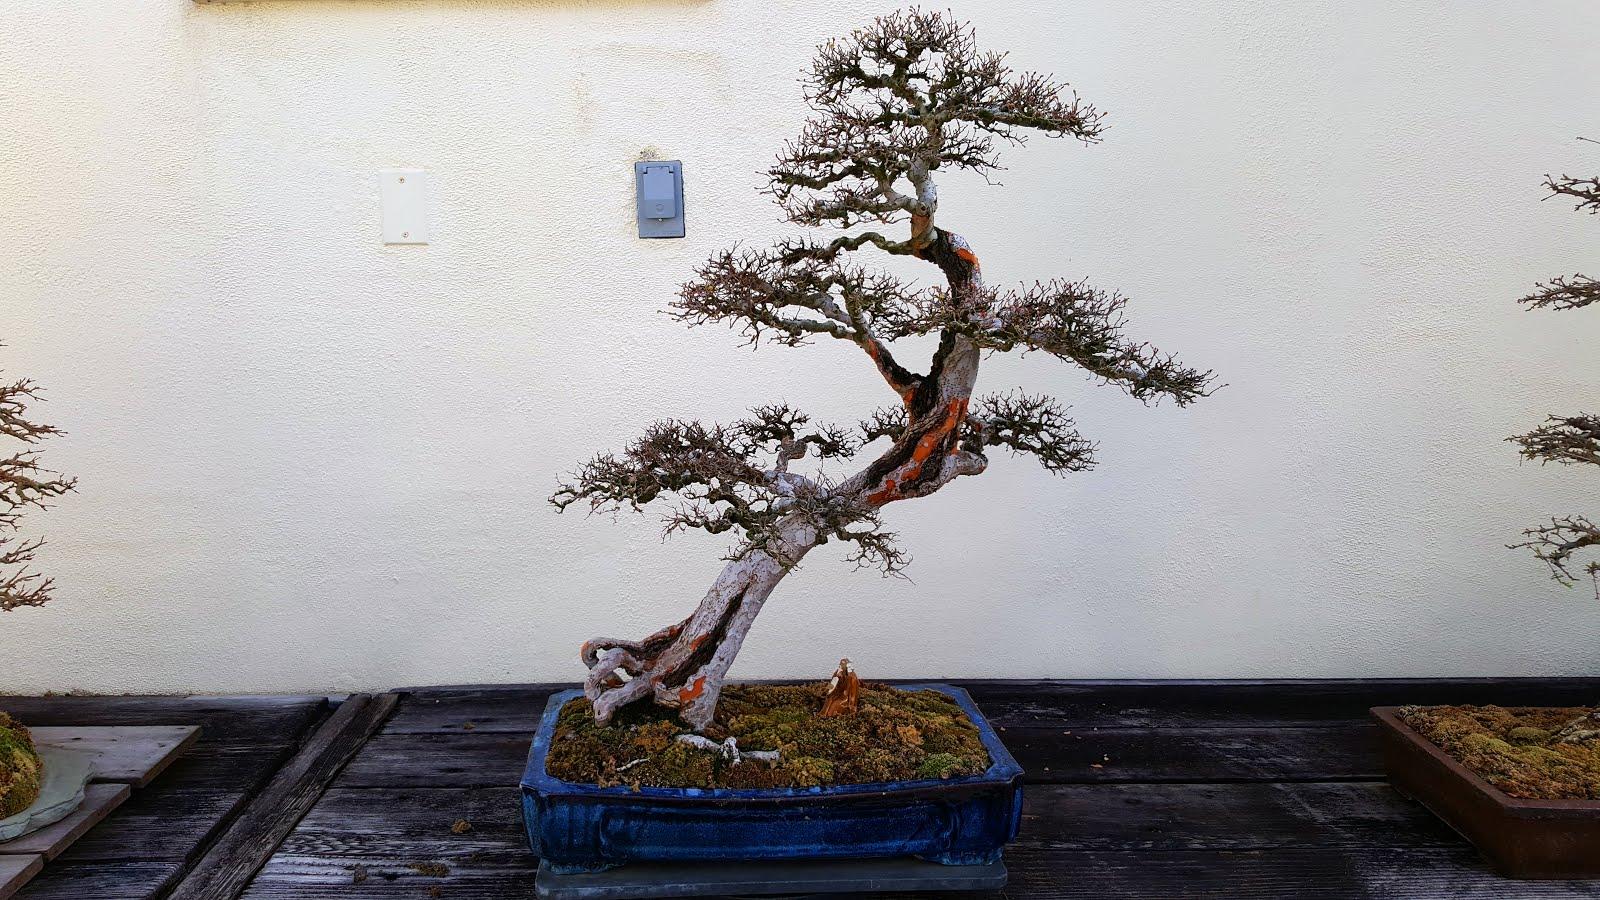 Self-balancing binary search tree